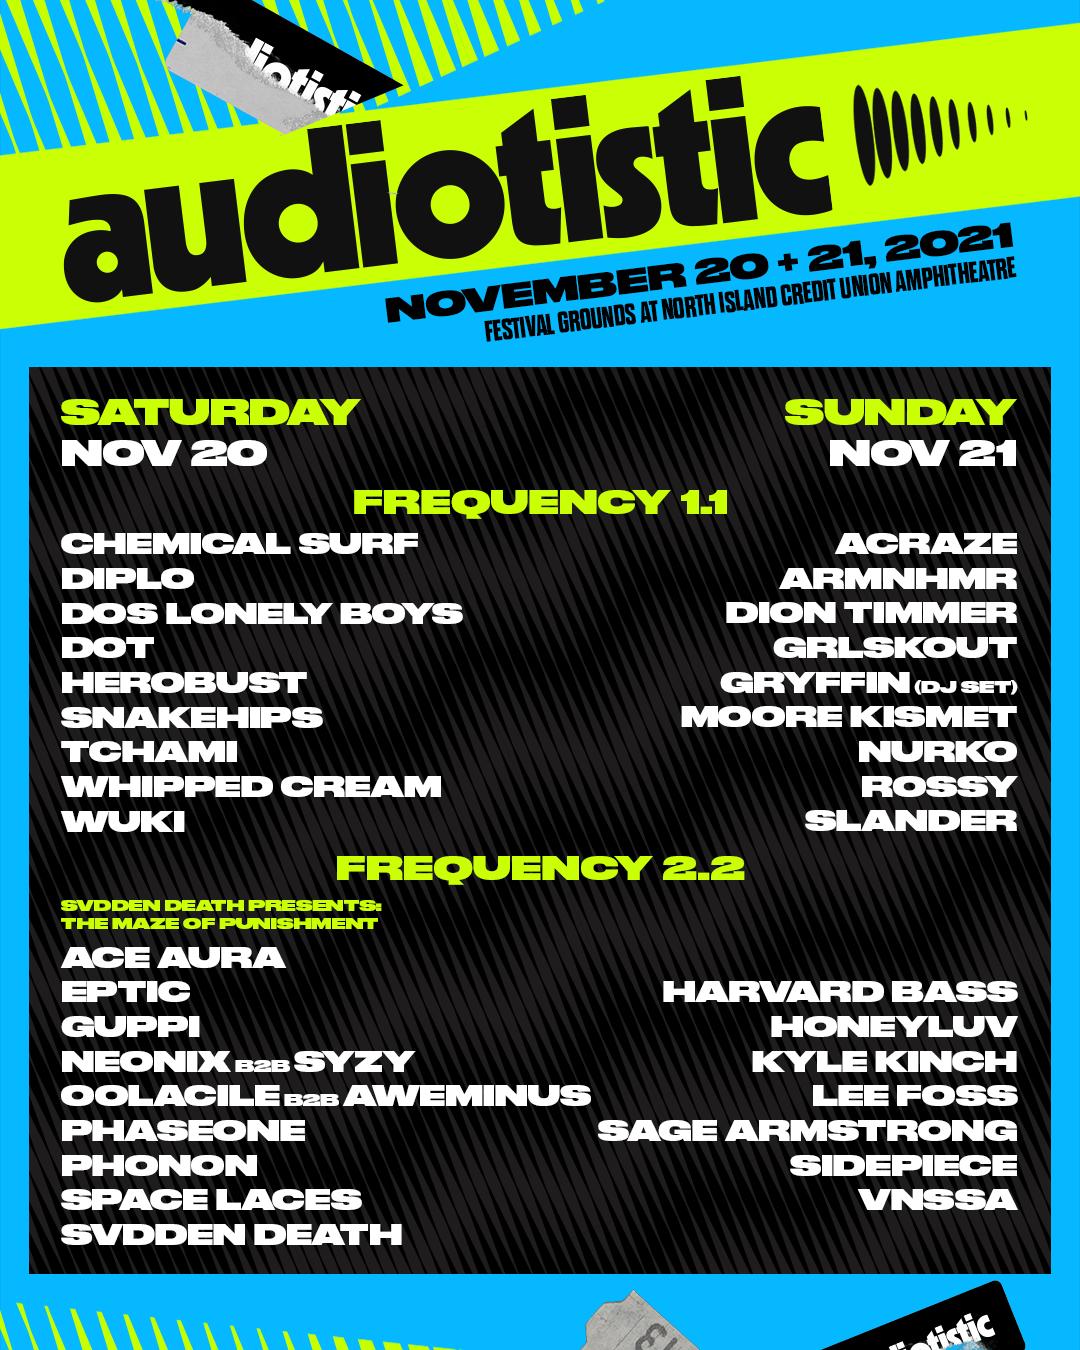 audiotistic san diego lineup